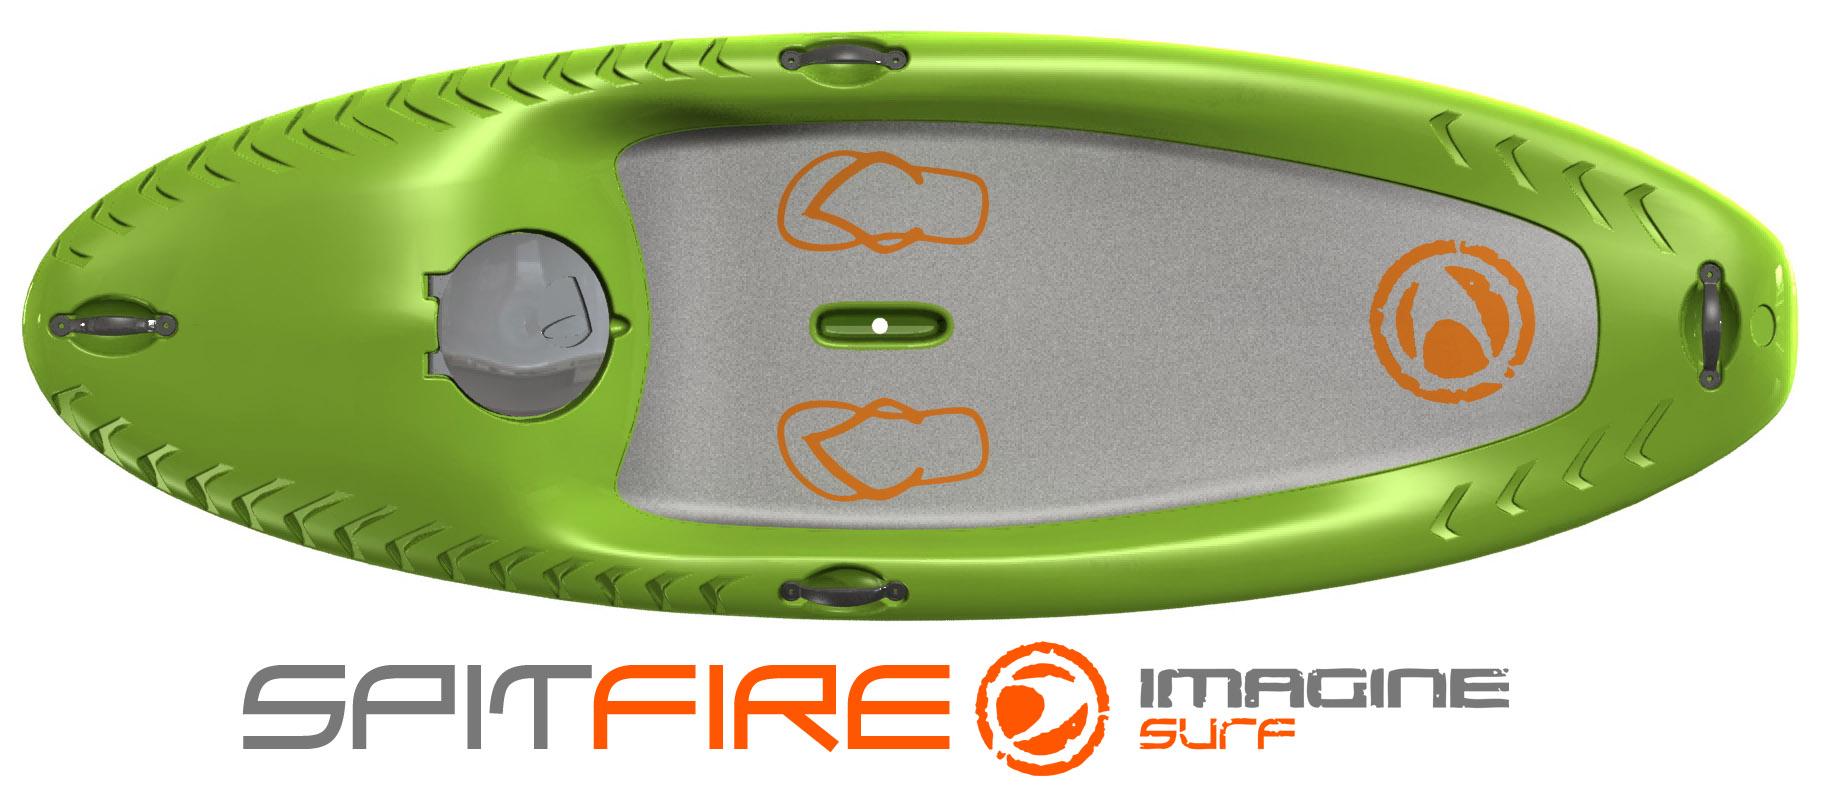 Click image for larger version  Name:spitfire2.jpg Views:101 Size:232.0 KB ID:9886